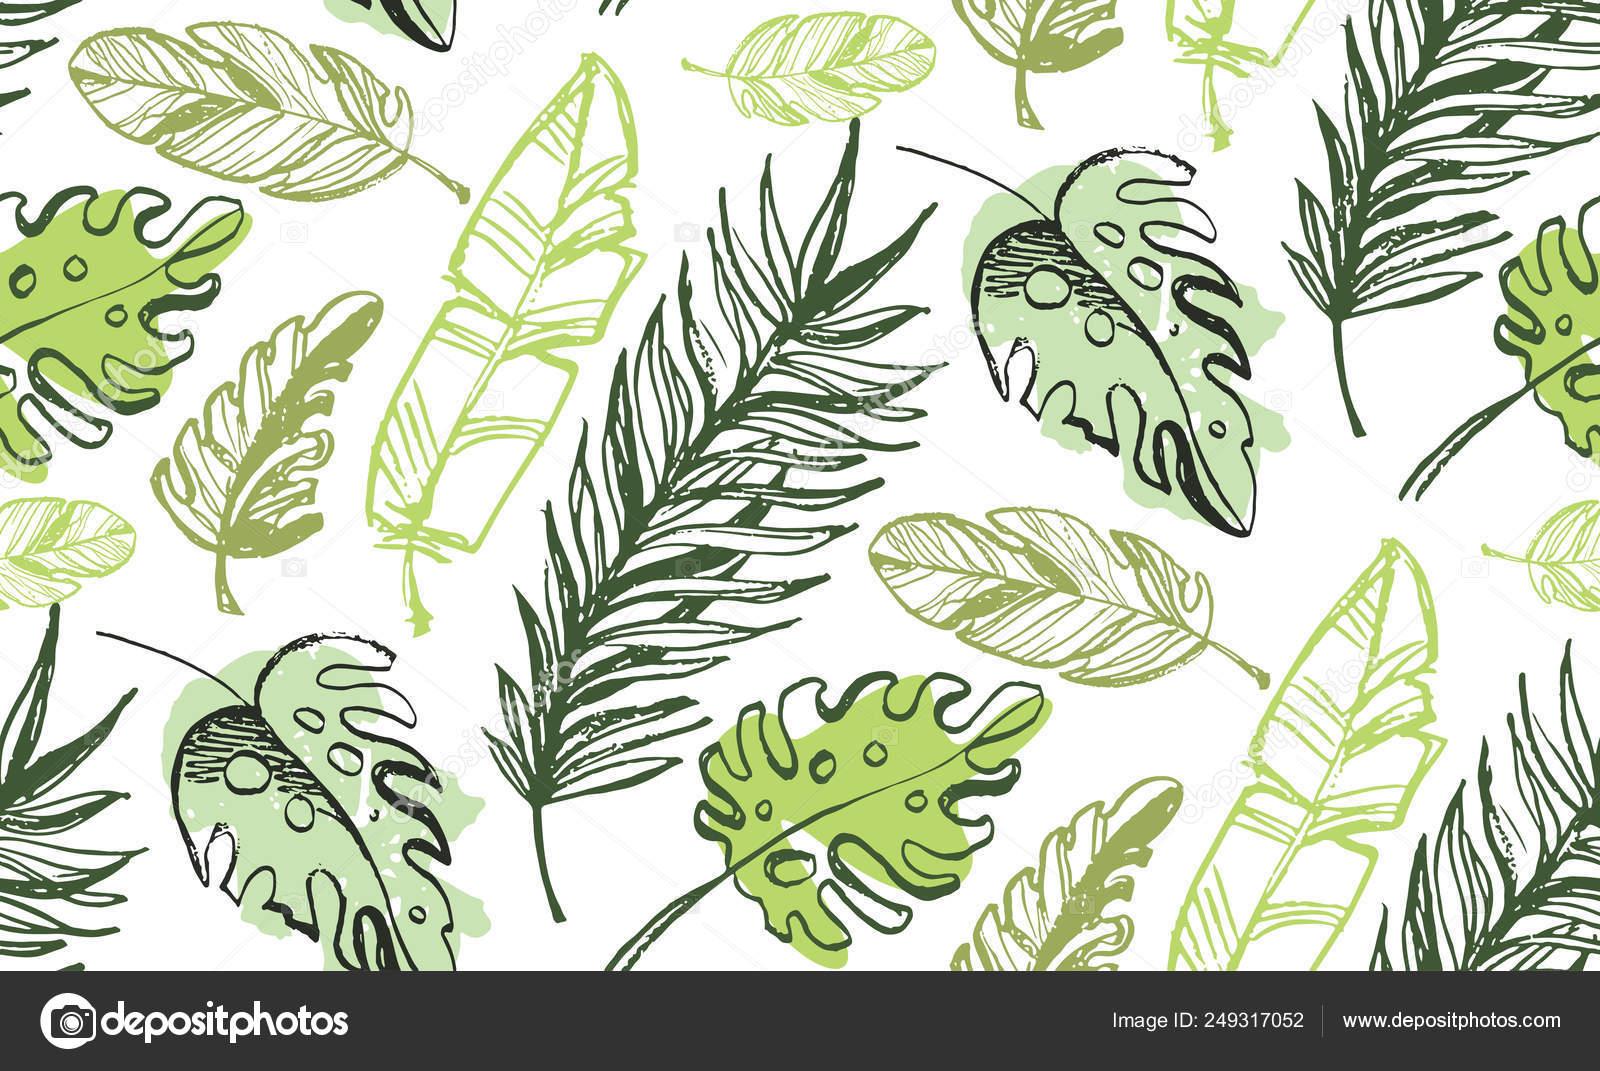 Hand Drawn Doodle Color Tropical Leaf Pattern Background Stock Vector C Jane55 249317052